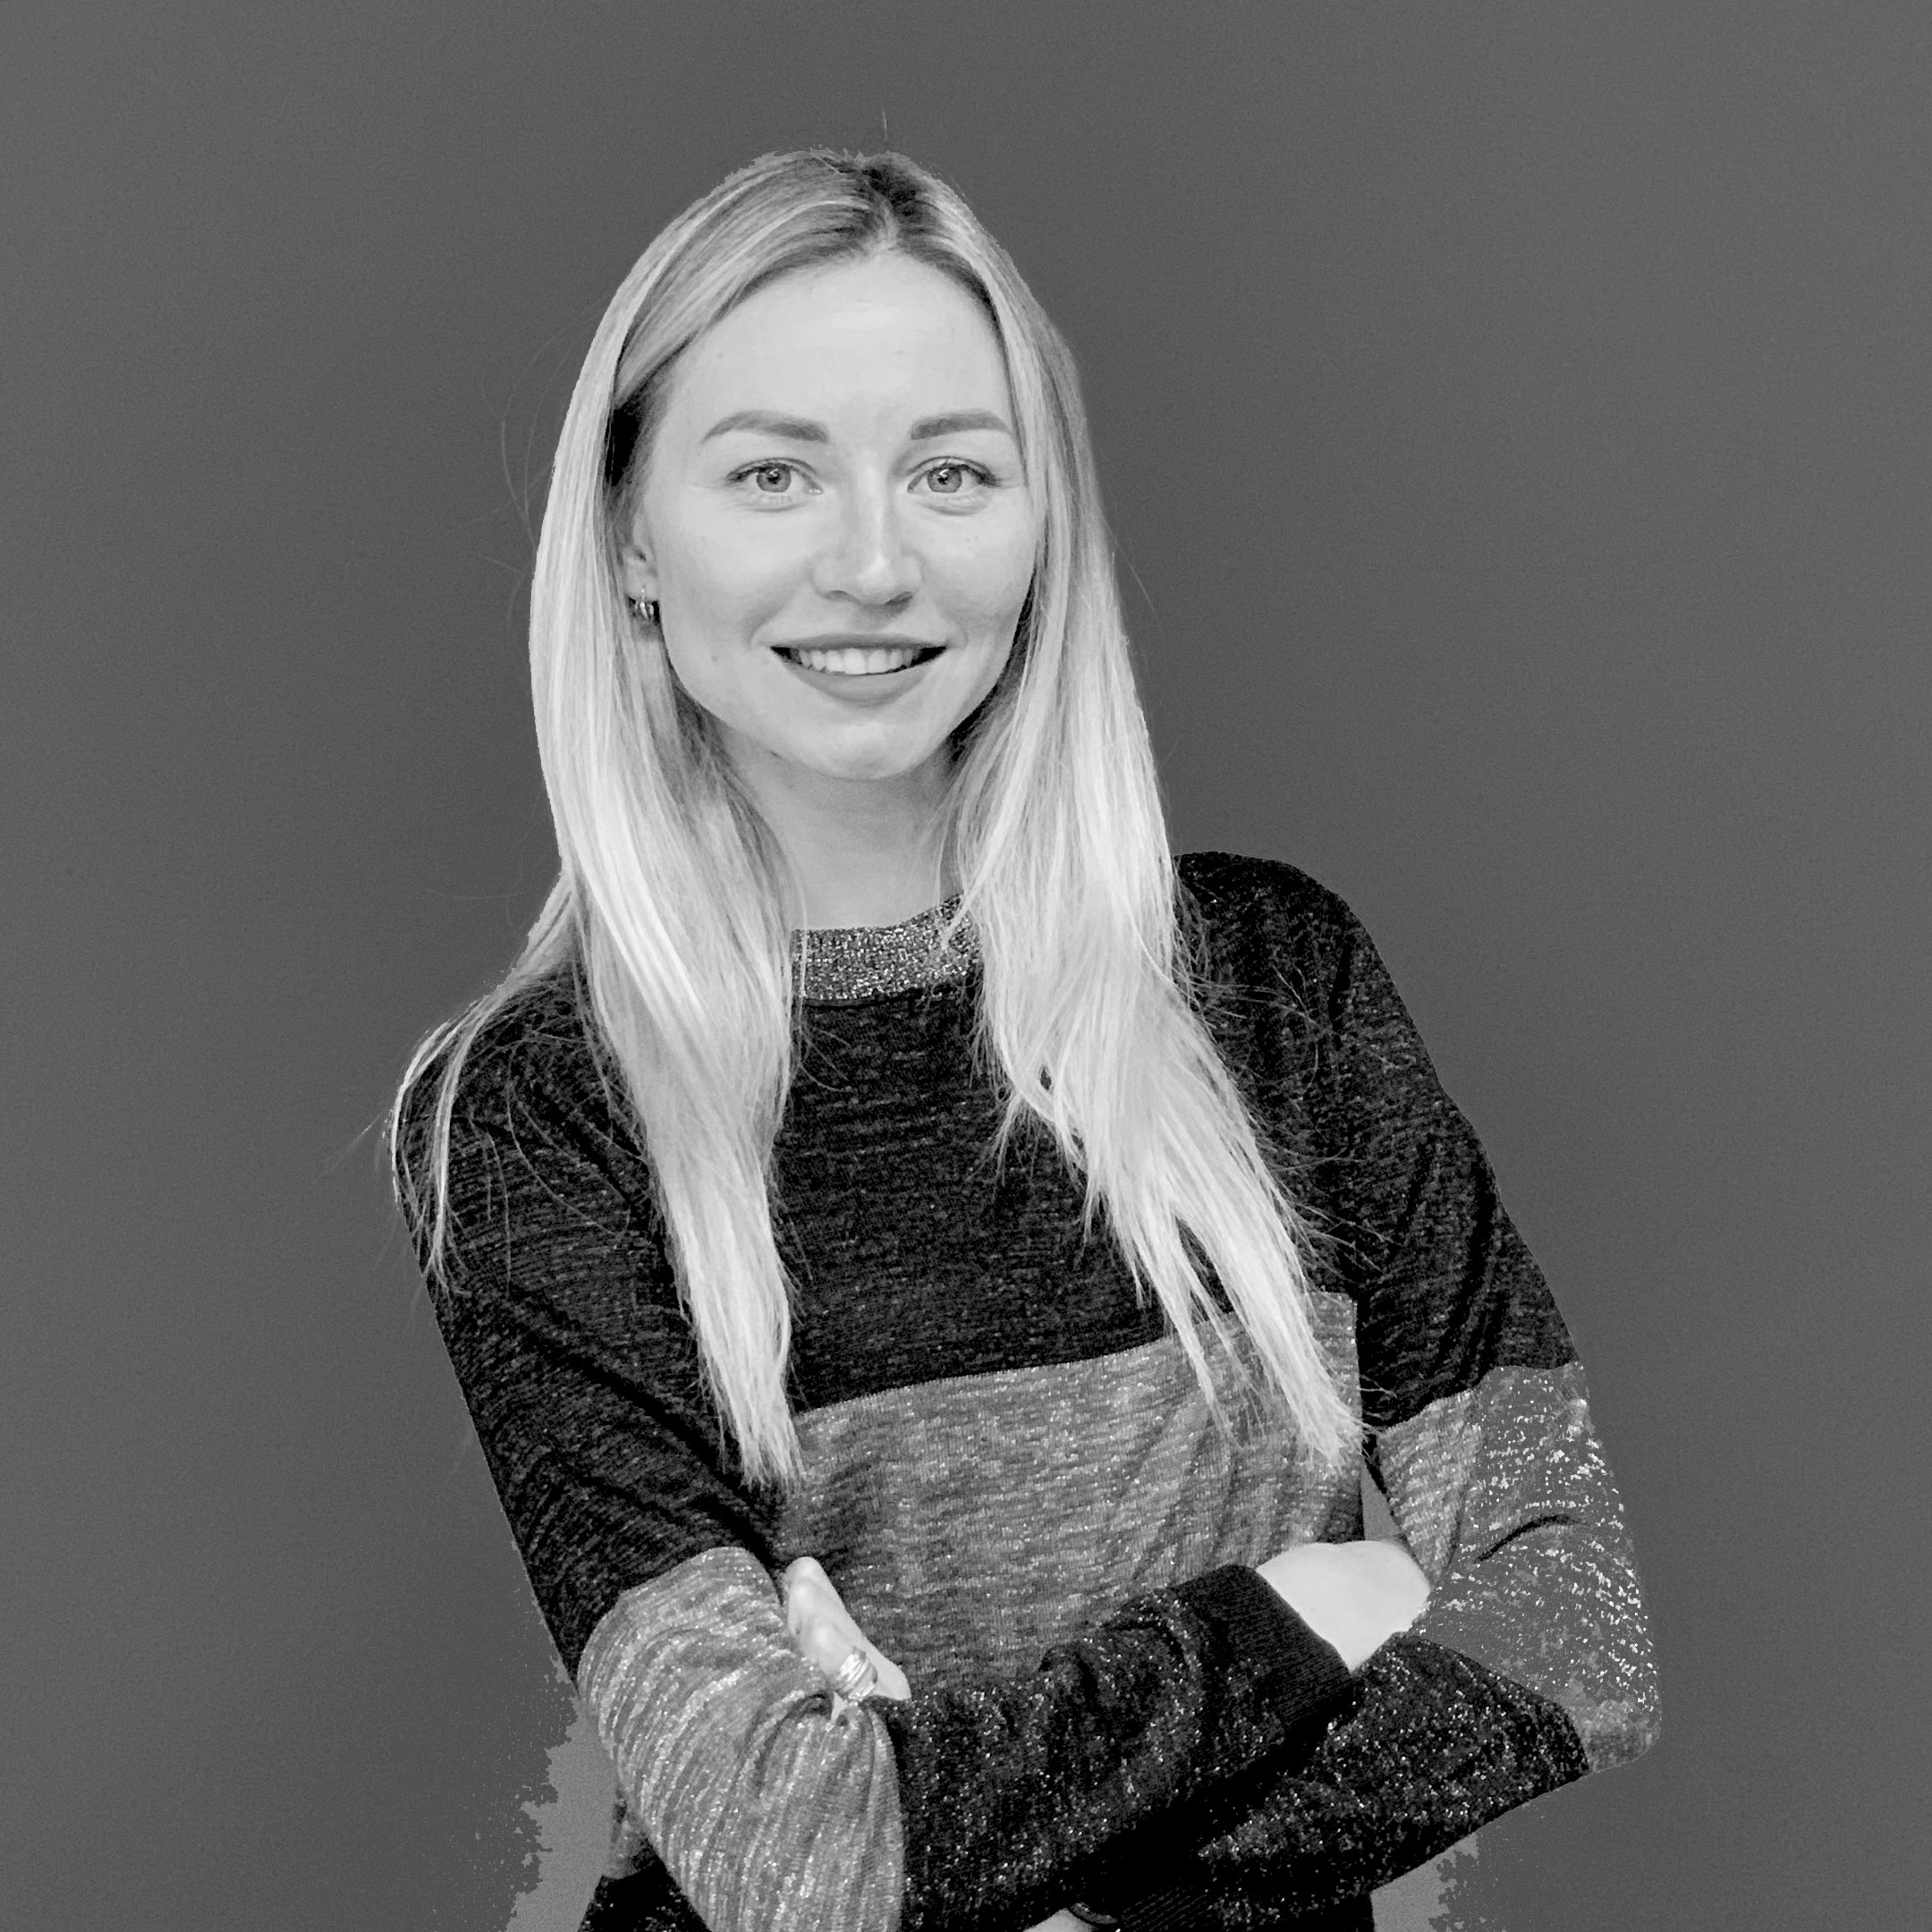 Iryna Dülger